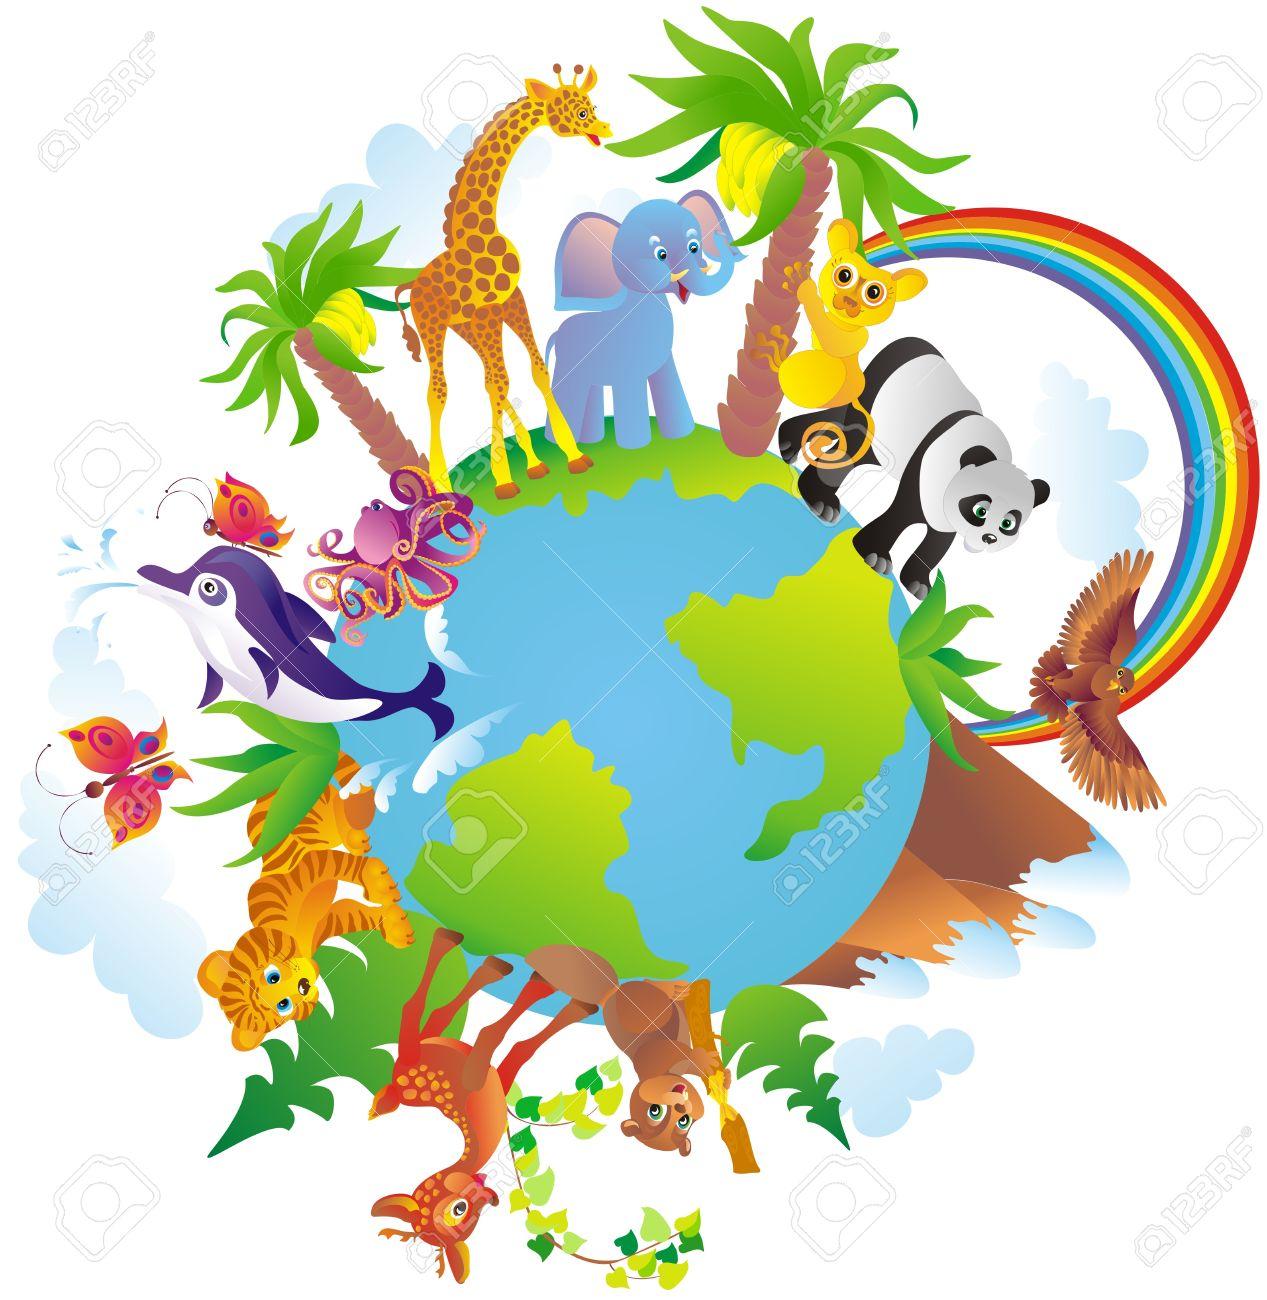 Cartoon animals walking around a globe Stock Vector - 16561268